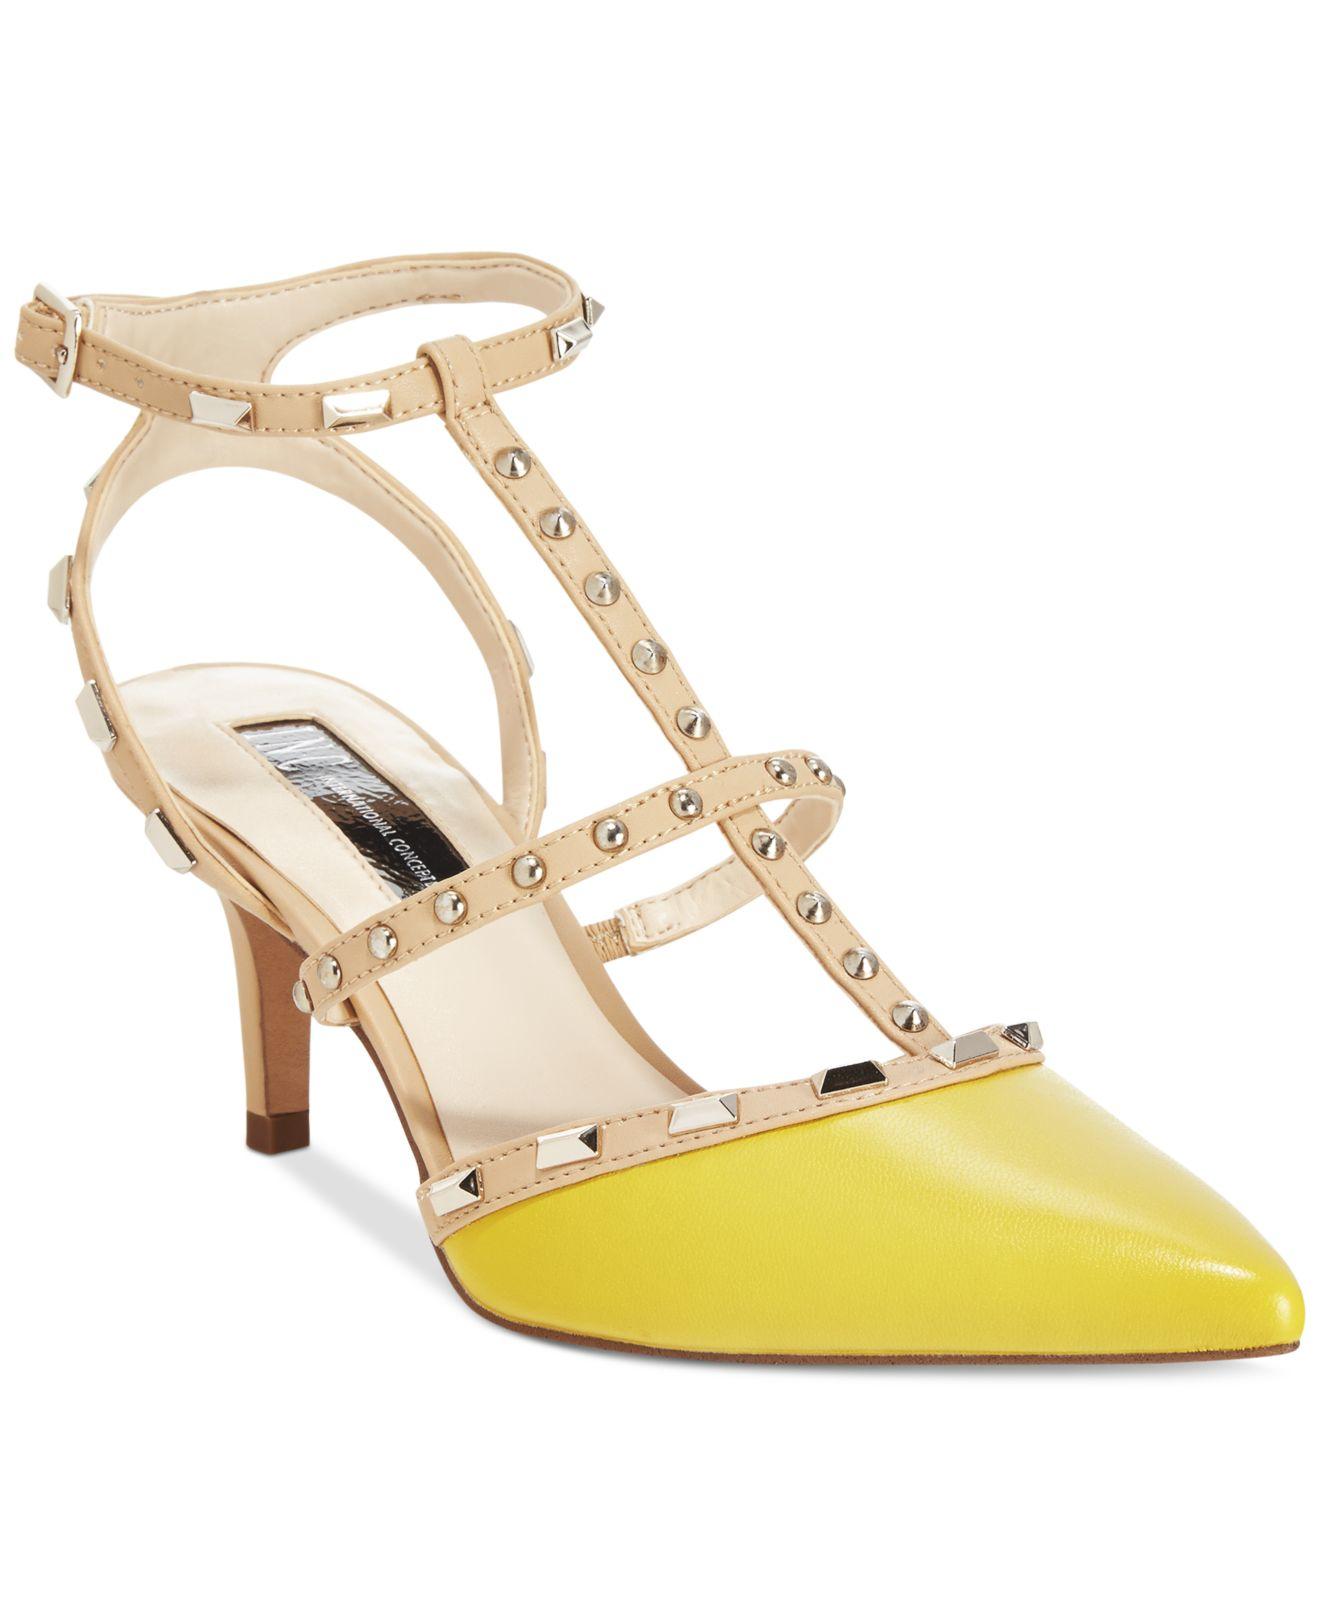 Gallery - Inc International Concepts Carma Pointed Toe Studded Kitten Heel